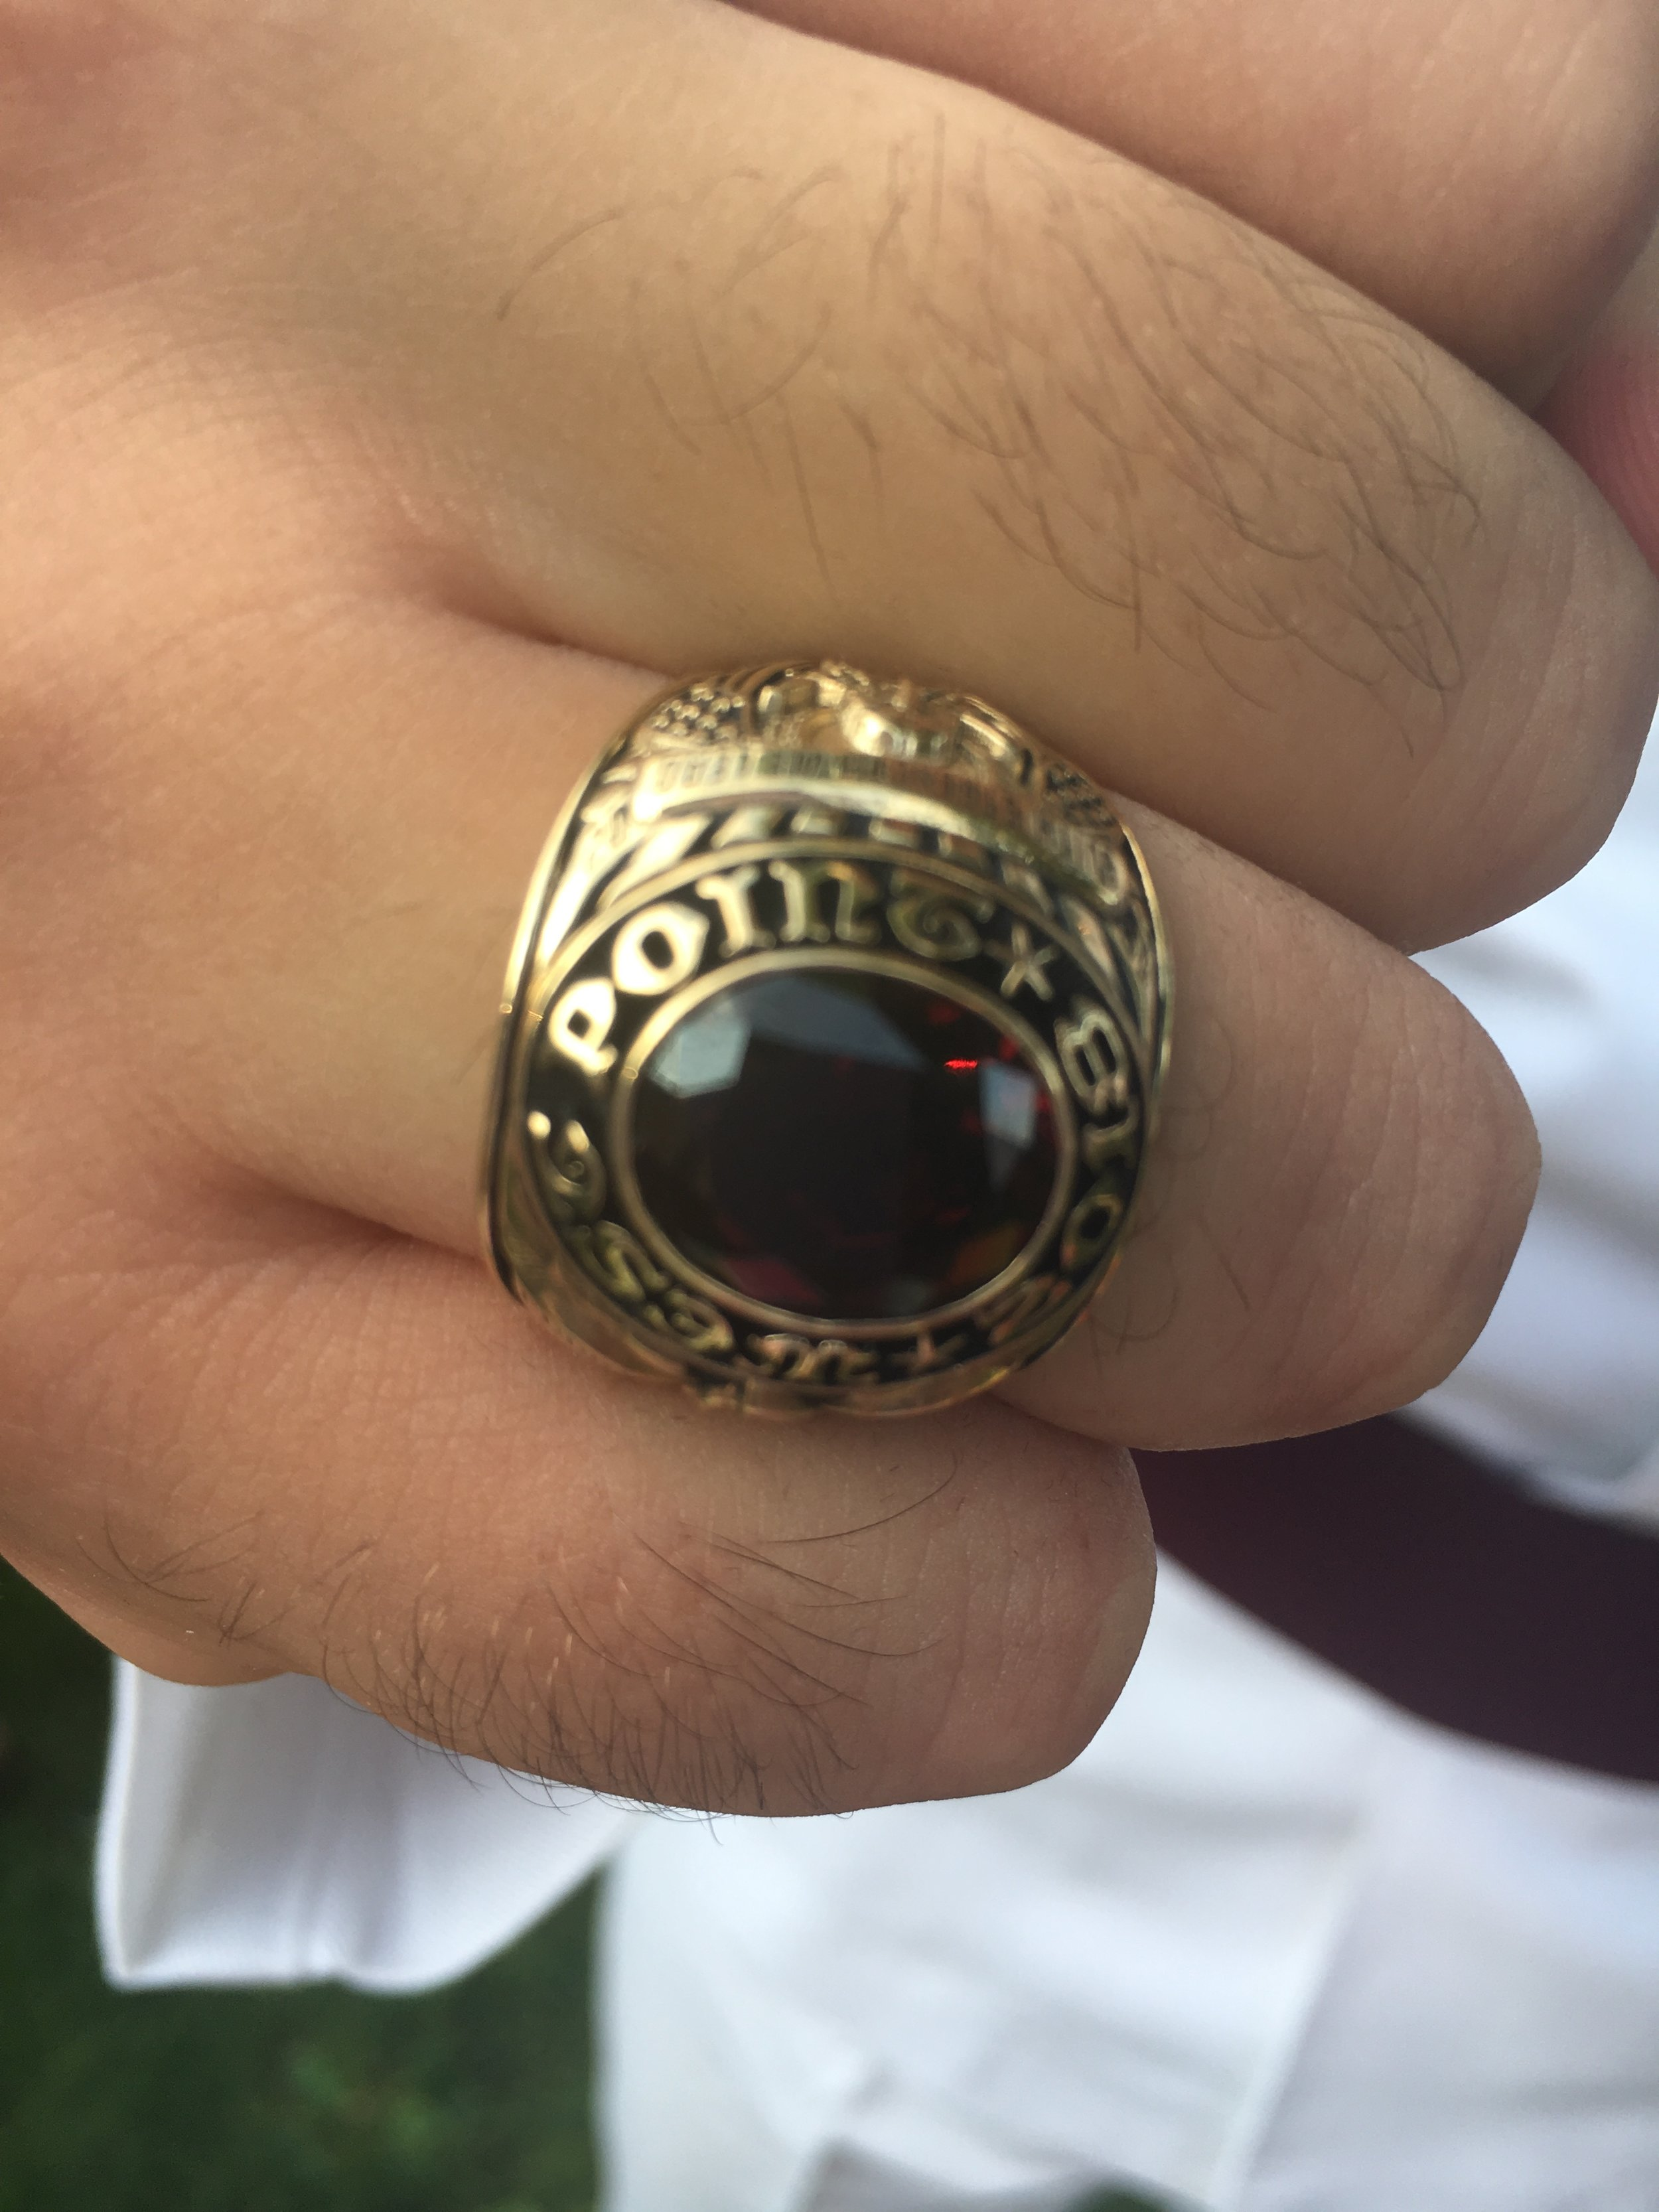 usma class ring, usma ring weekend